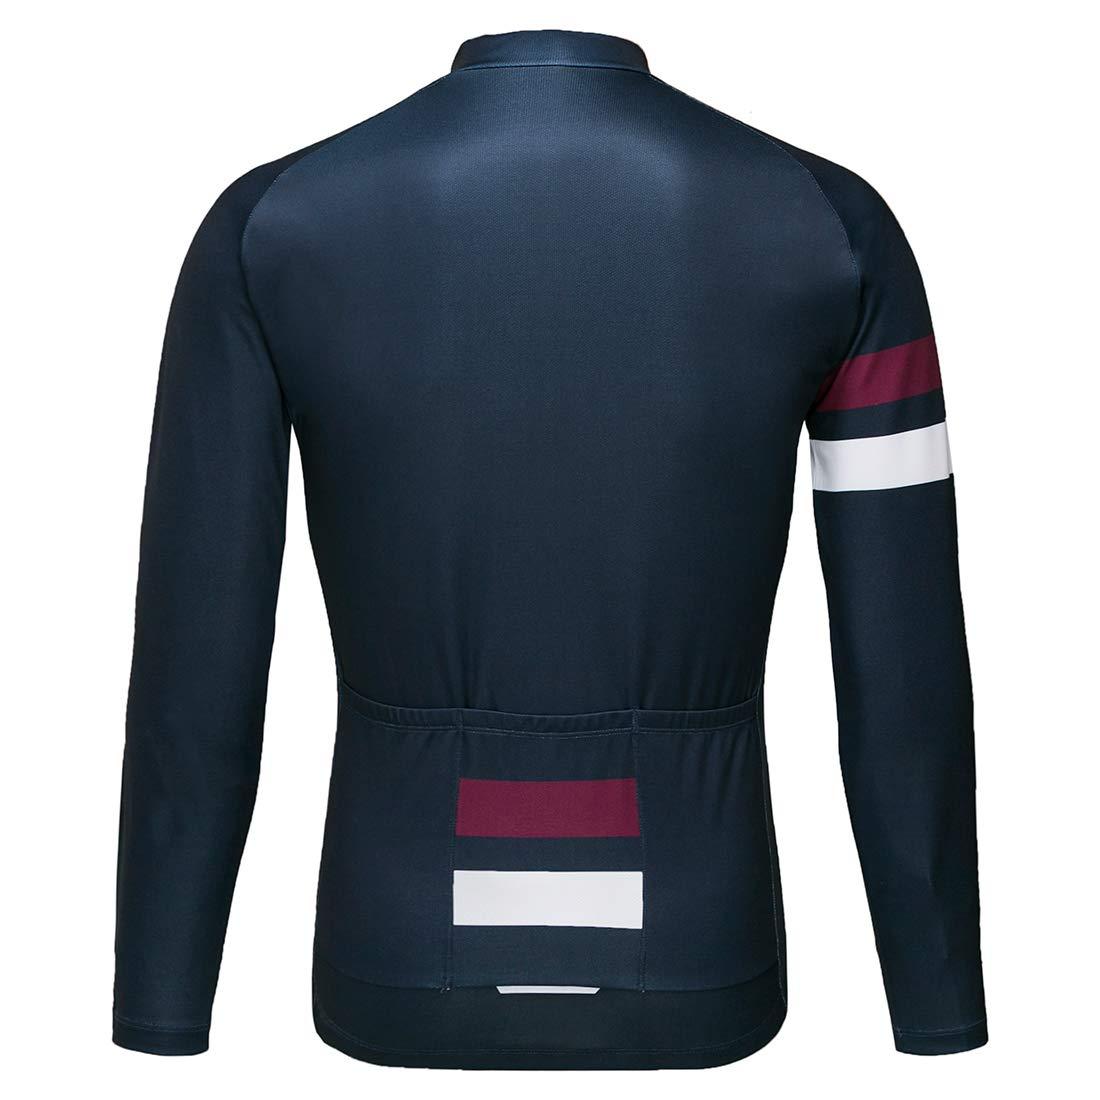 Wantdo Mens Long Sleeve Cycling Jerseys Biking Shirt Breathable Quick Dry Road Mountain Bicycle Jacket